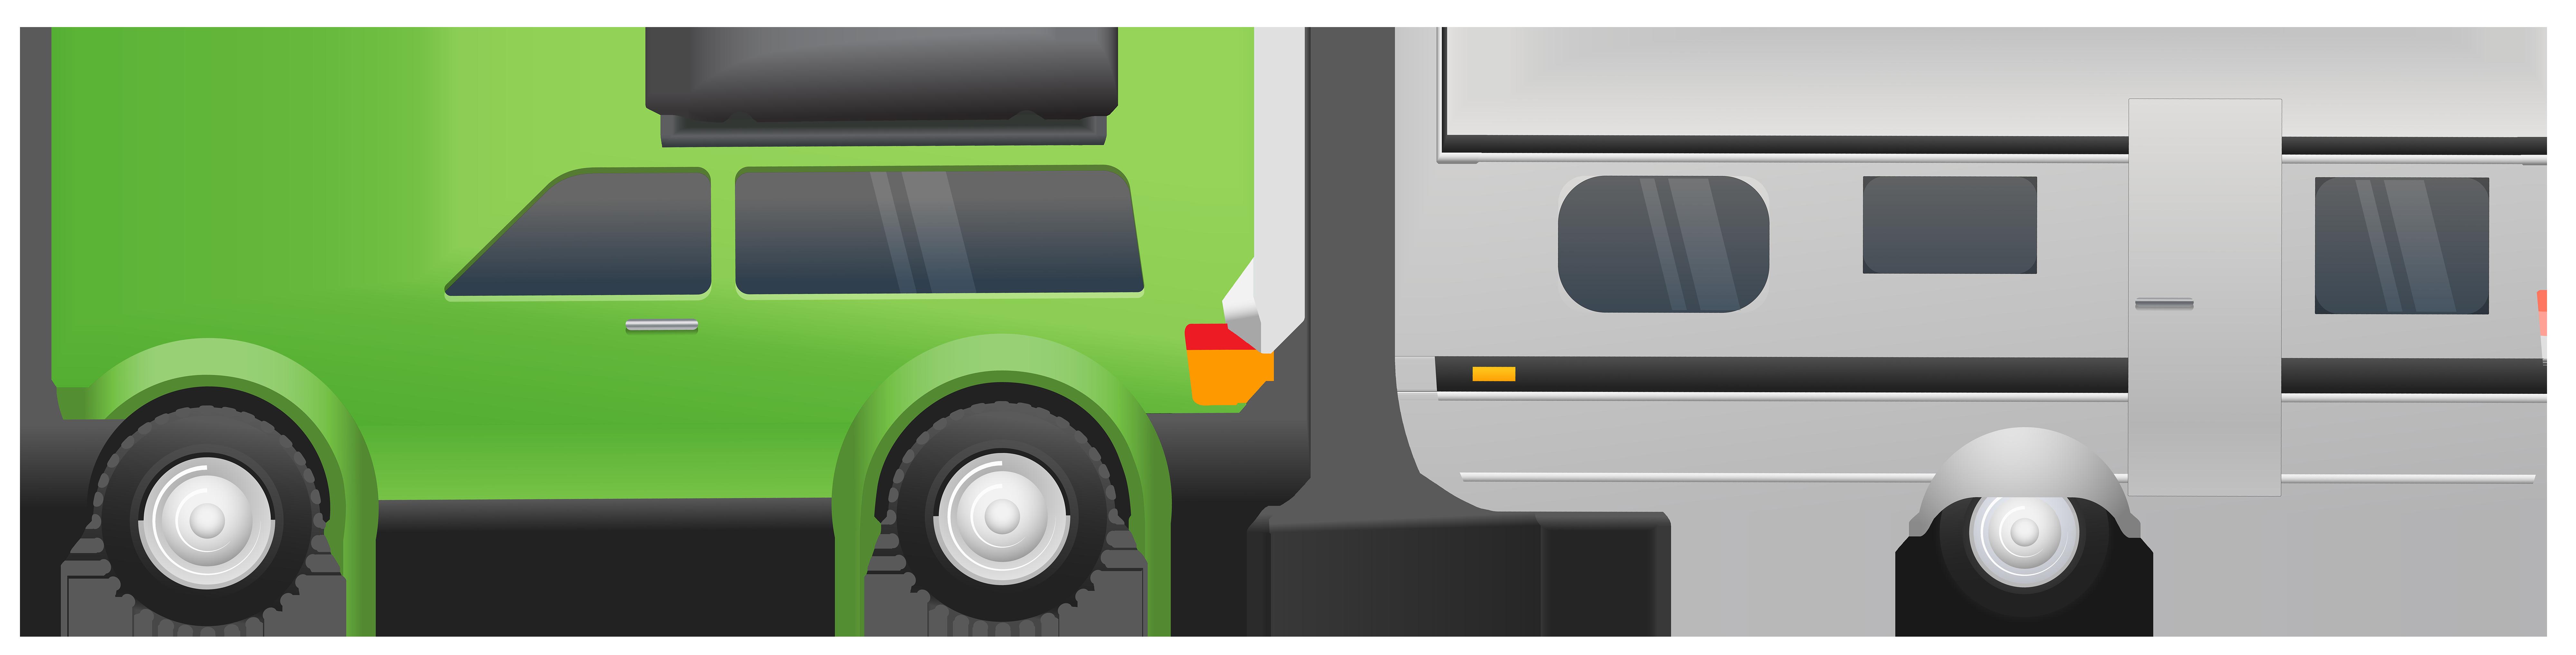 Transportation clipart land clip art. Car with caravan png